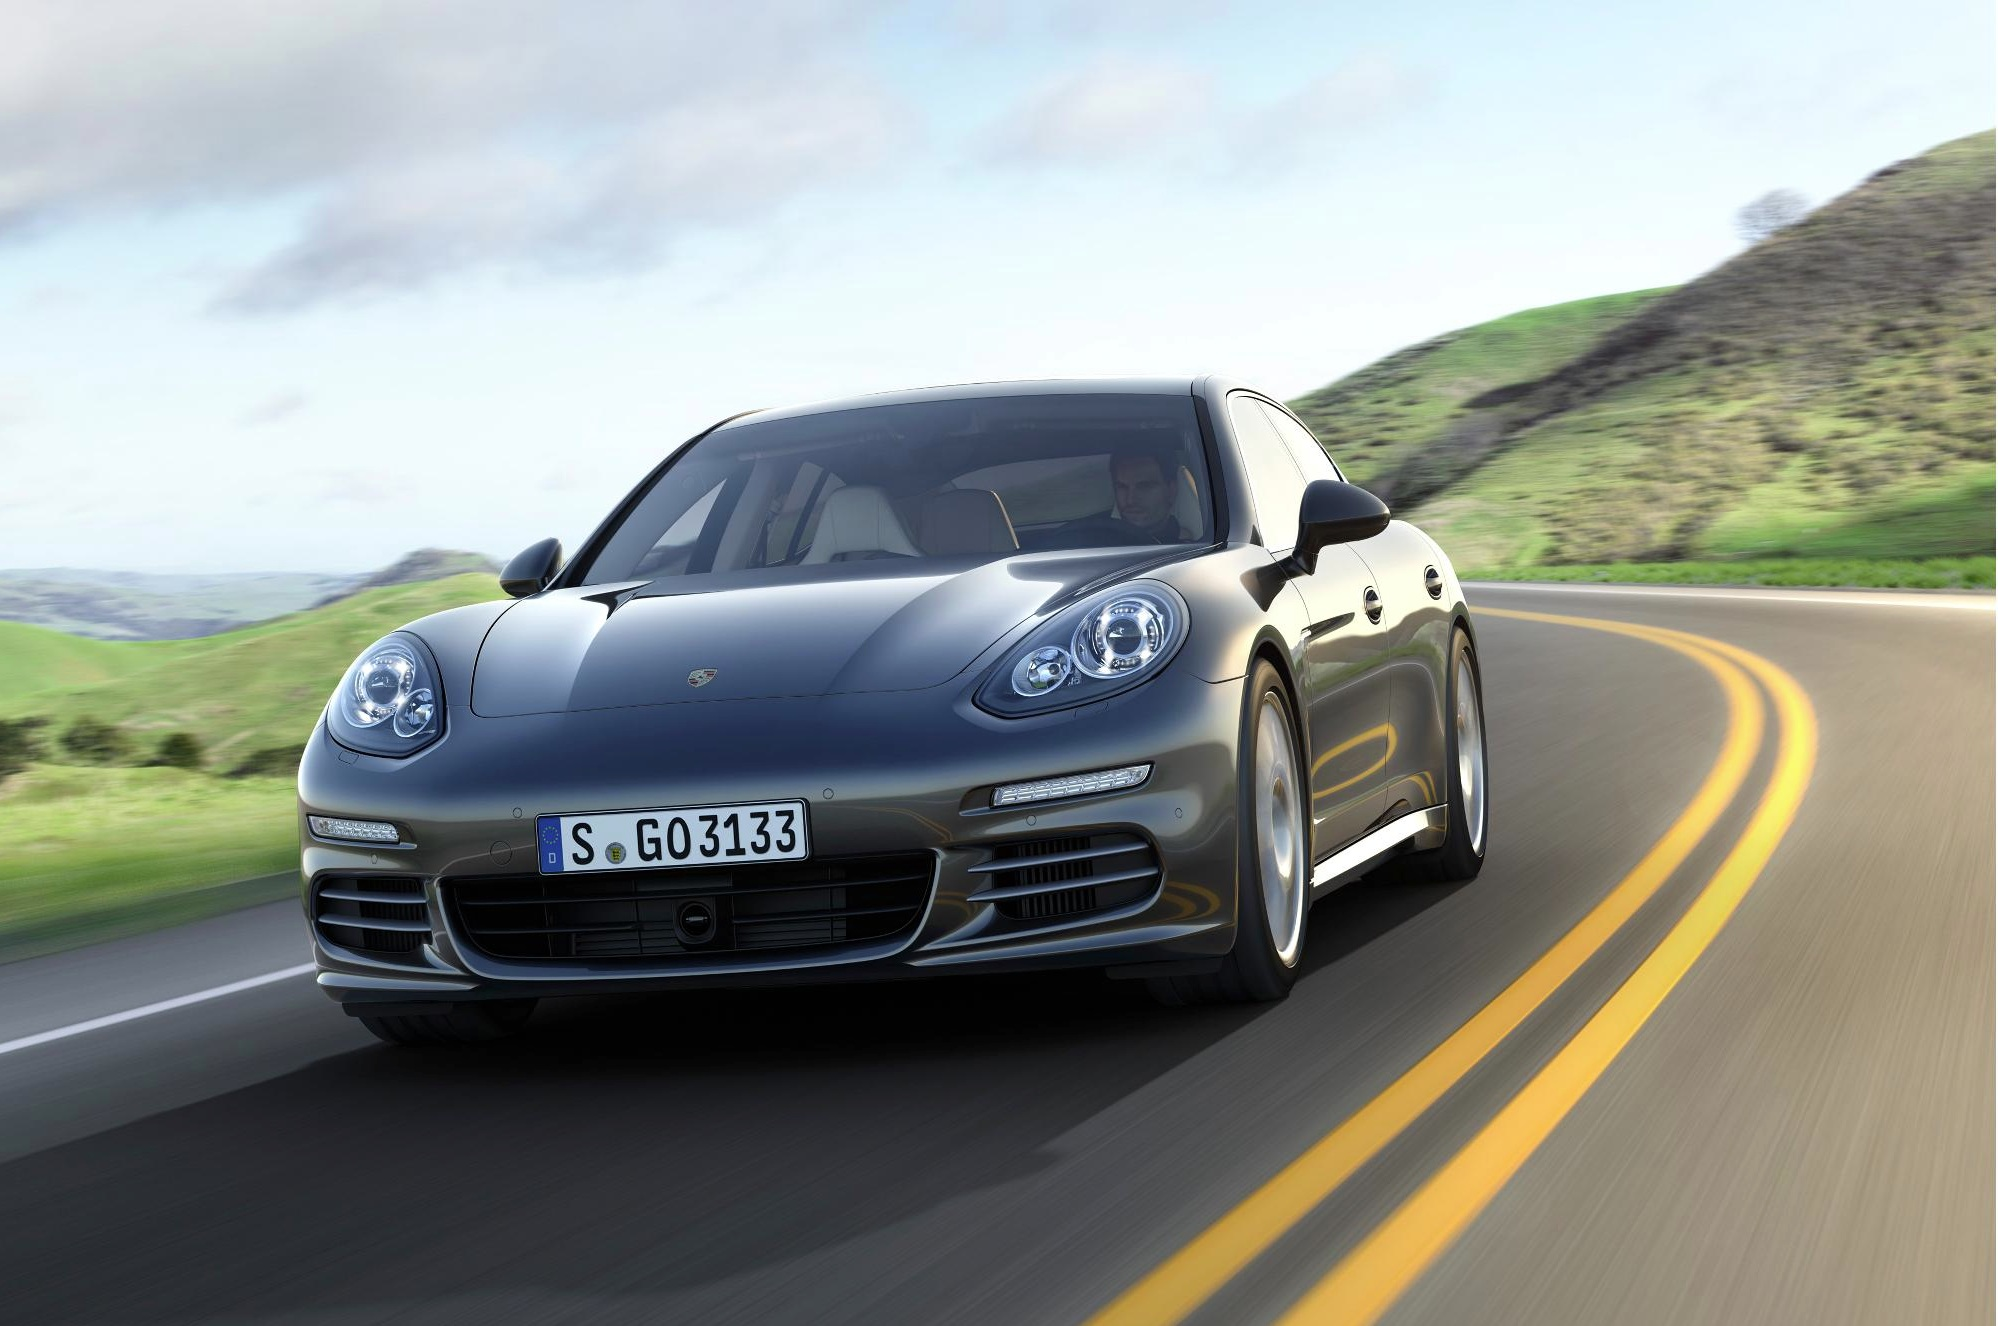 Porsche Panamera S E Hybrid 2017 2016